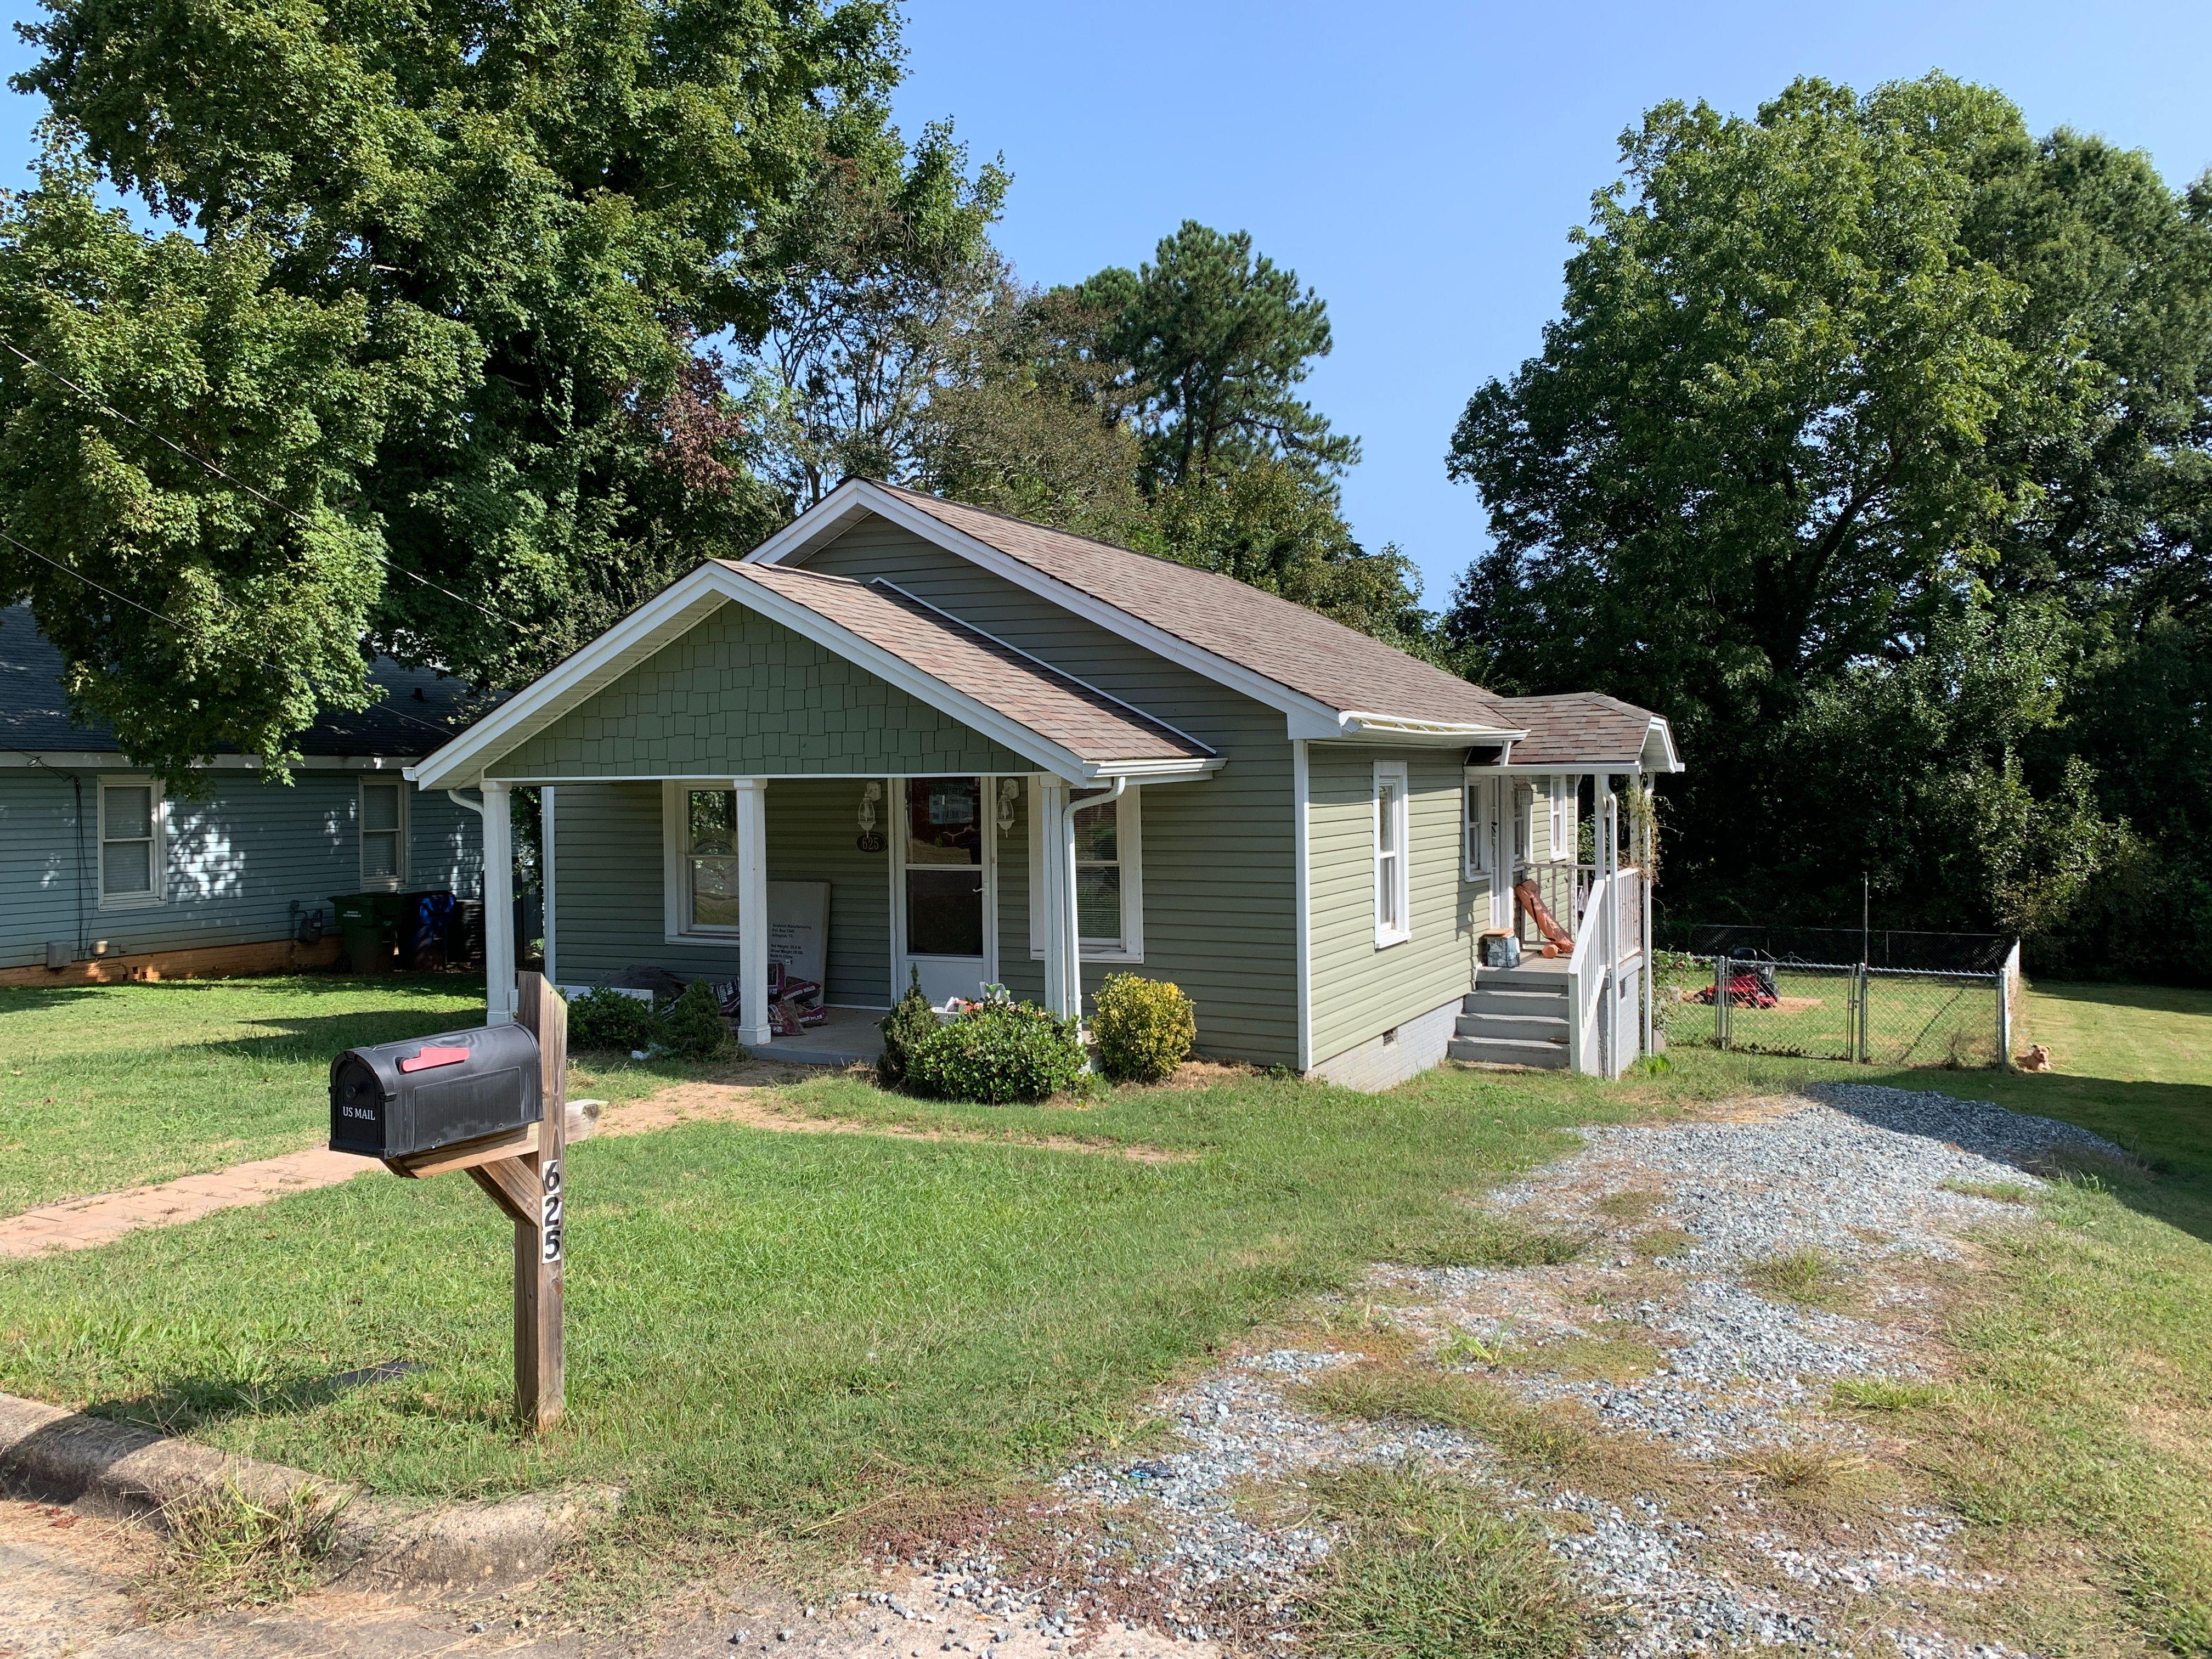 625 New St, Graham, NC